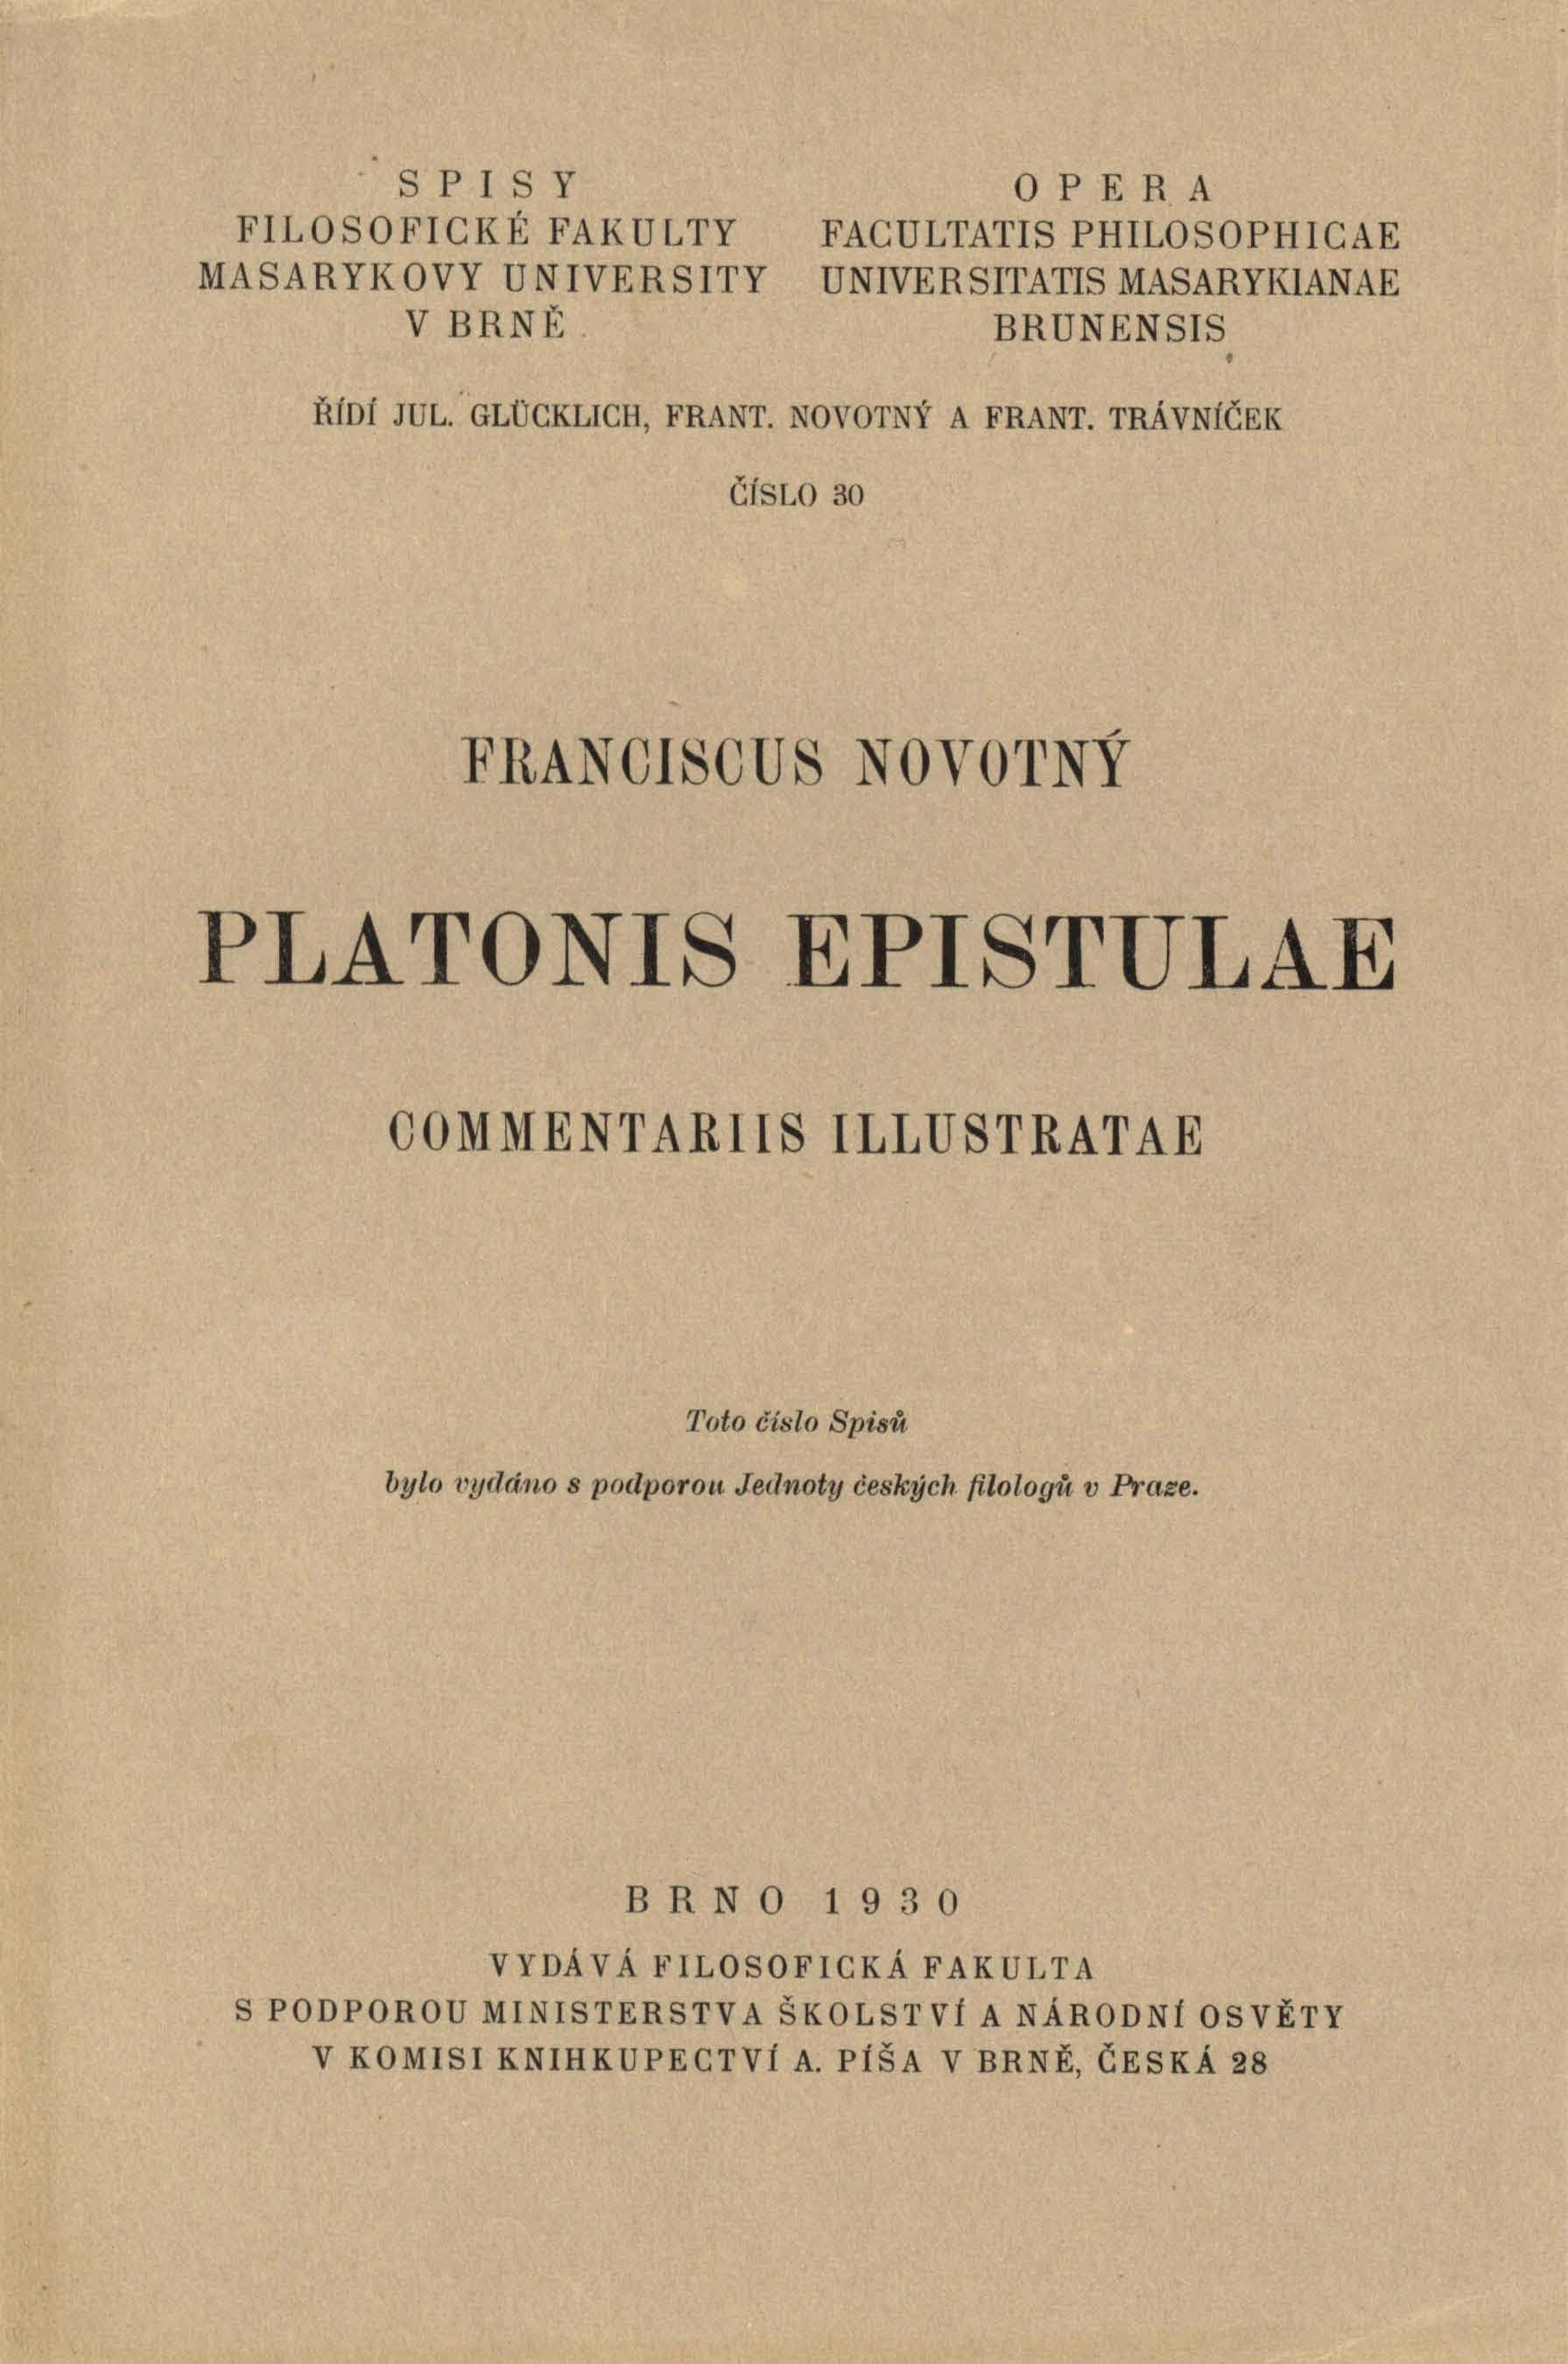 Obálka pro Platonis epistulae commentariis illustratae